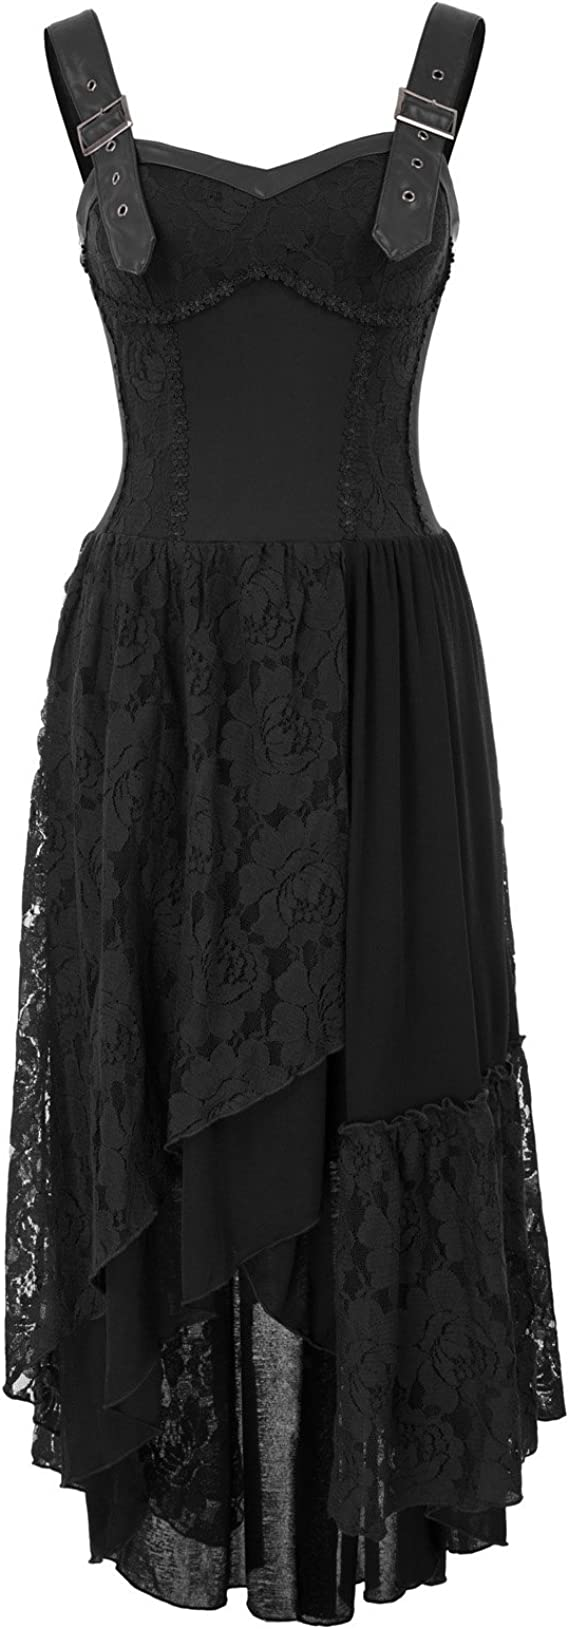 Steampunk Clothing, Fashion, Costumes Women Steampunk Gothic Victorian Long Dress Sleeveless Irregular Lace Dresses  AT vintagedancer.com